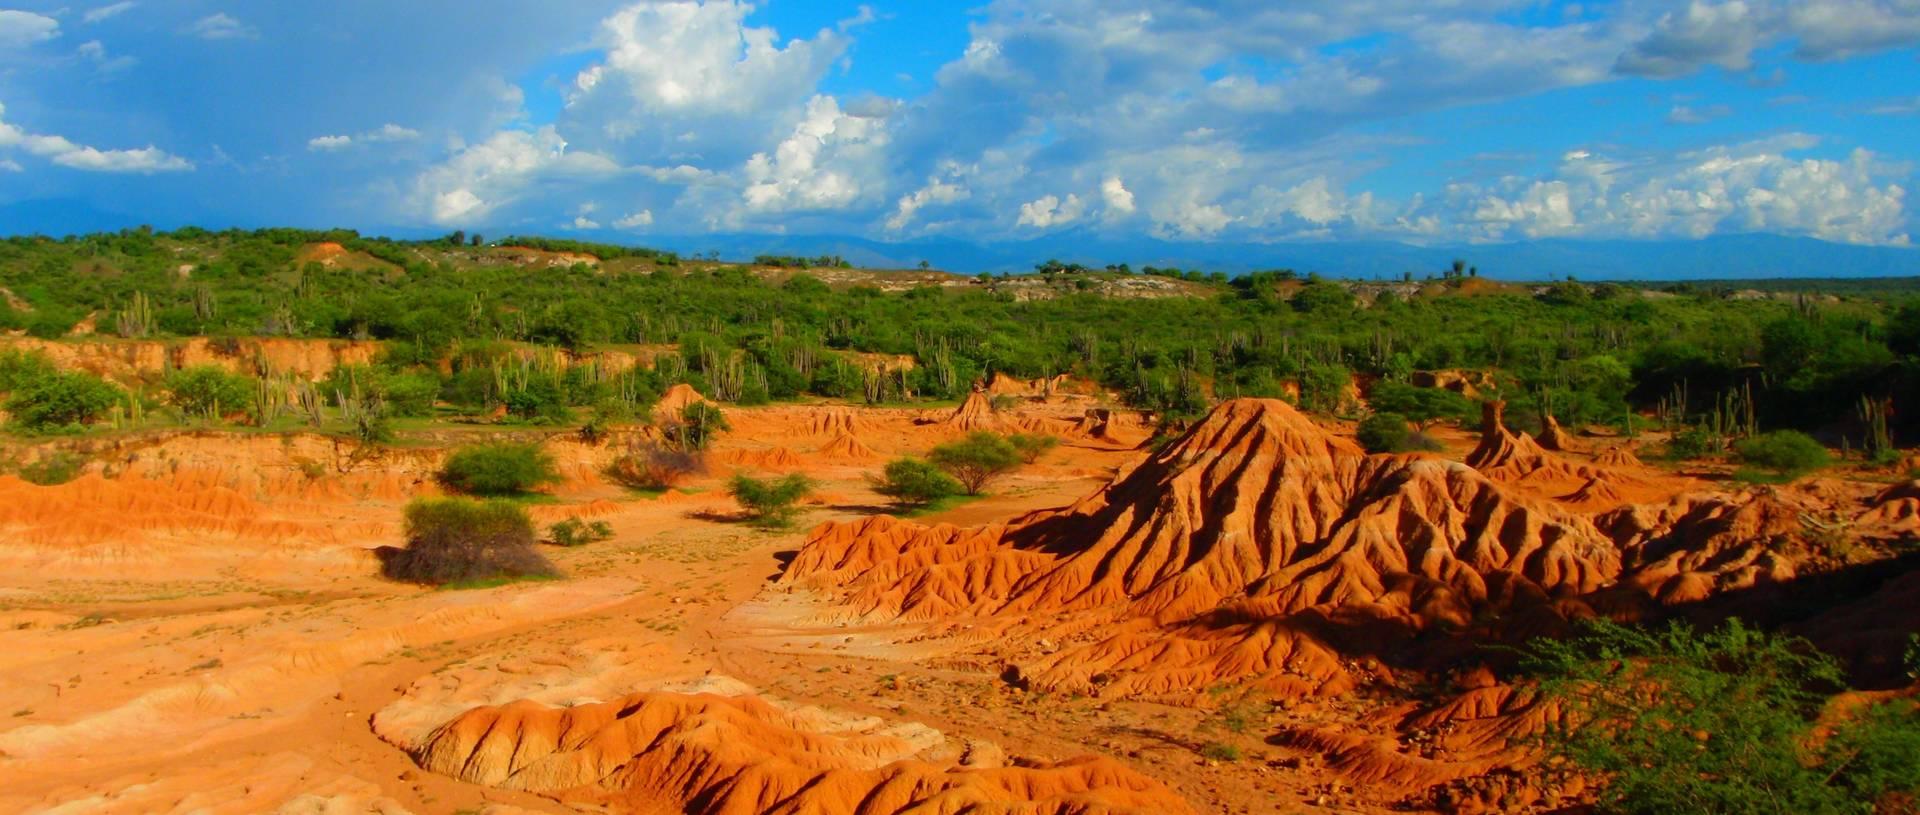 Desert Tatacoa Colombia